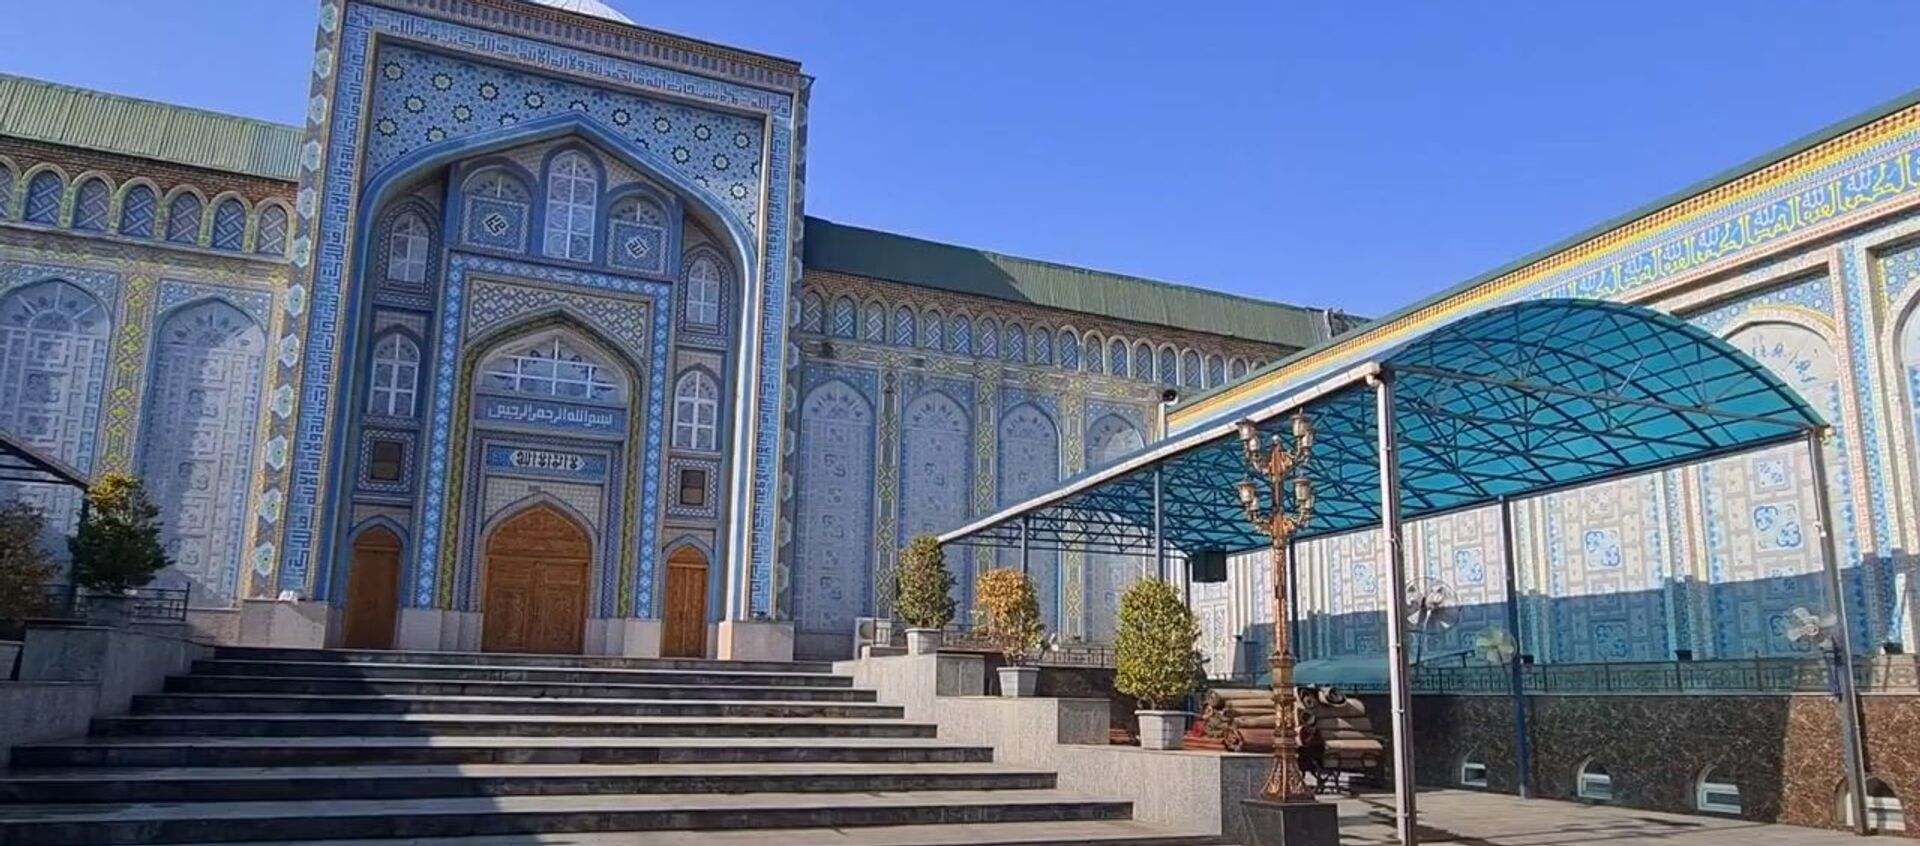 В Таджикистане открылись мечети - Sputnik Тоҷикистон, 1920, 02.02.2021